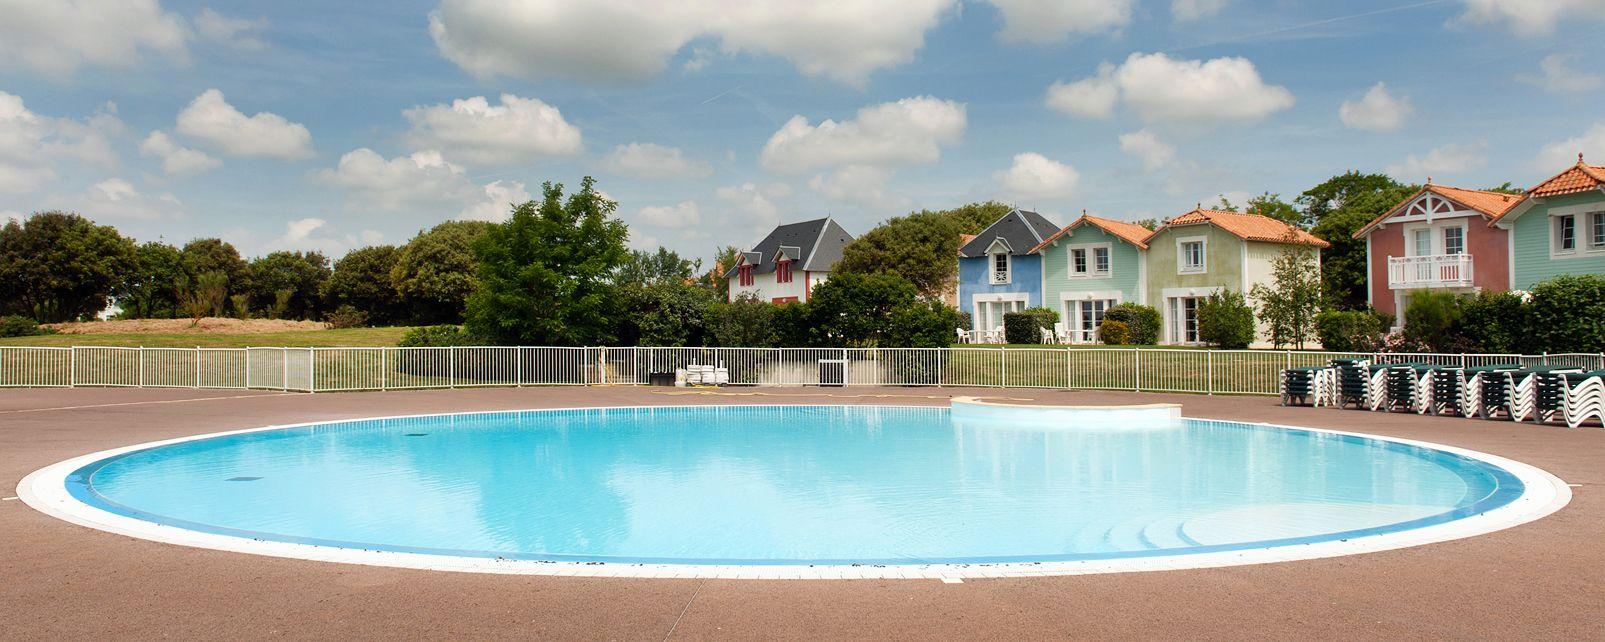 H tel pierre vacances village club port bourgenay - Village pierre et vacances port bourgenay ...